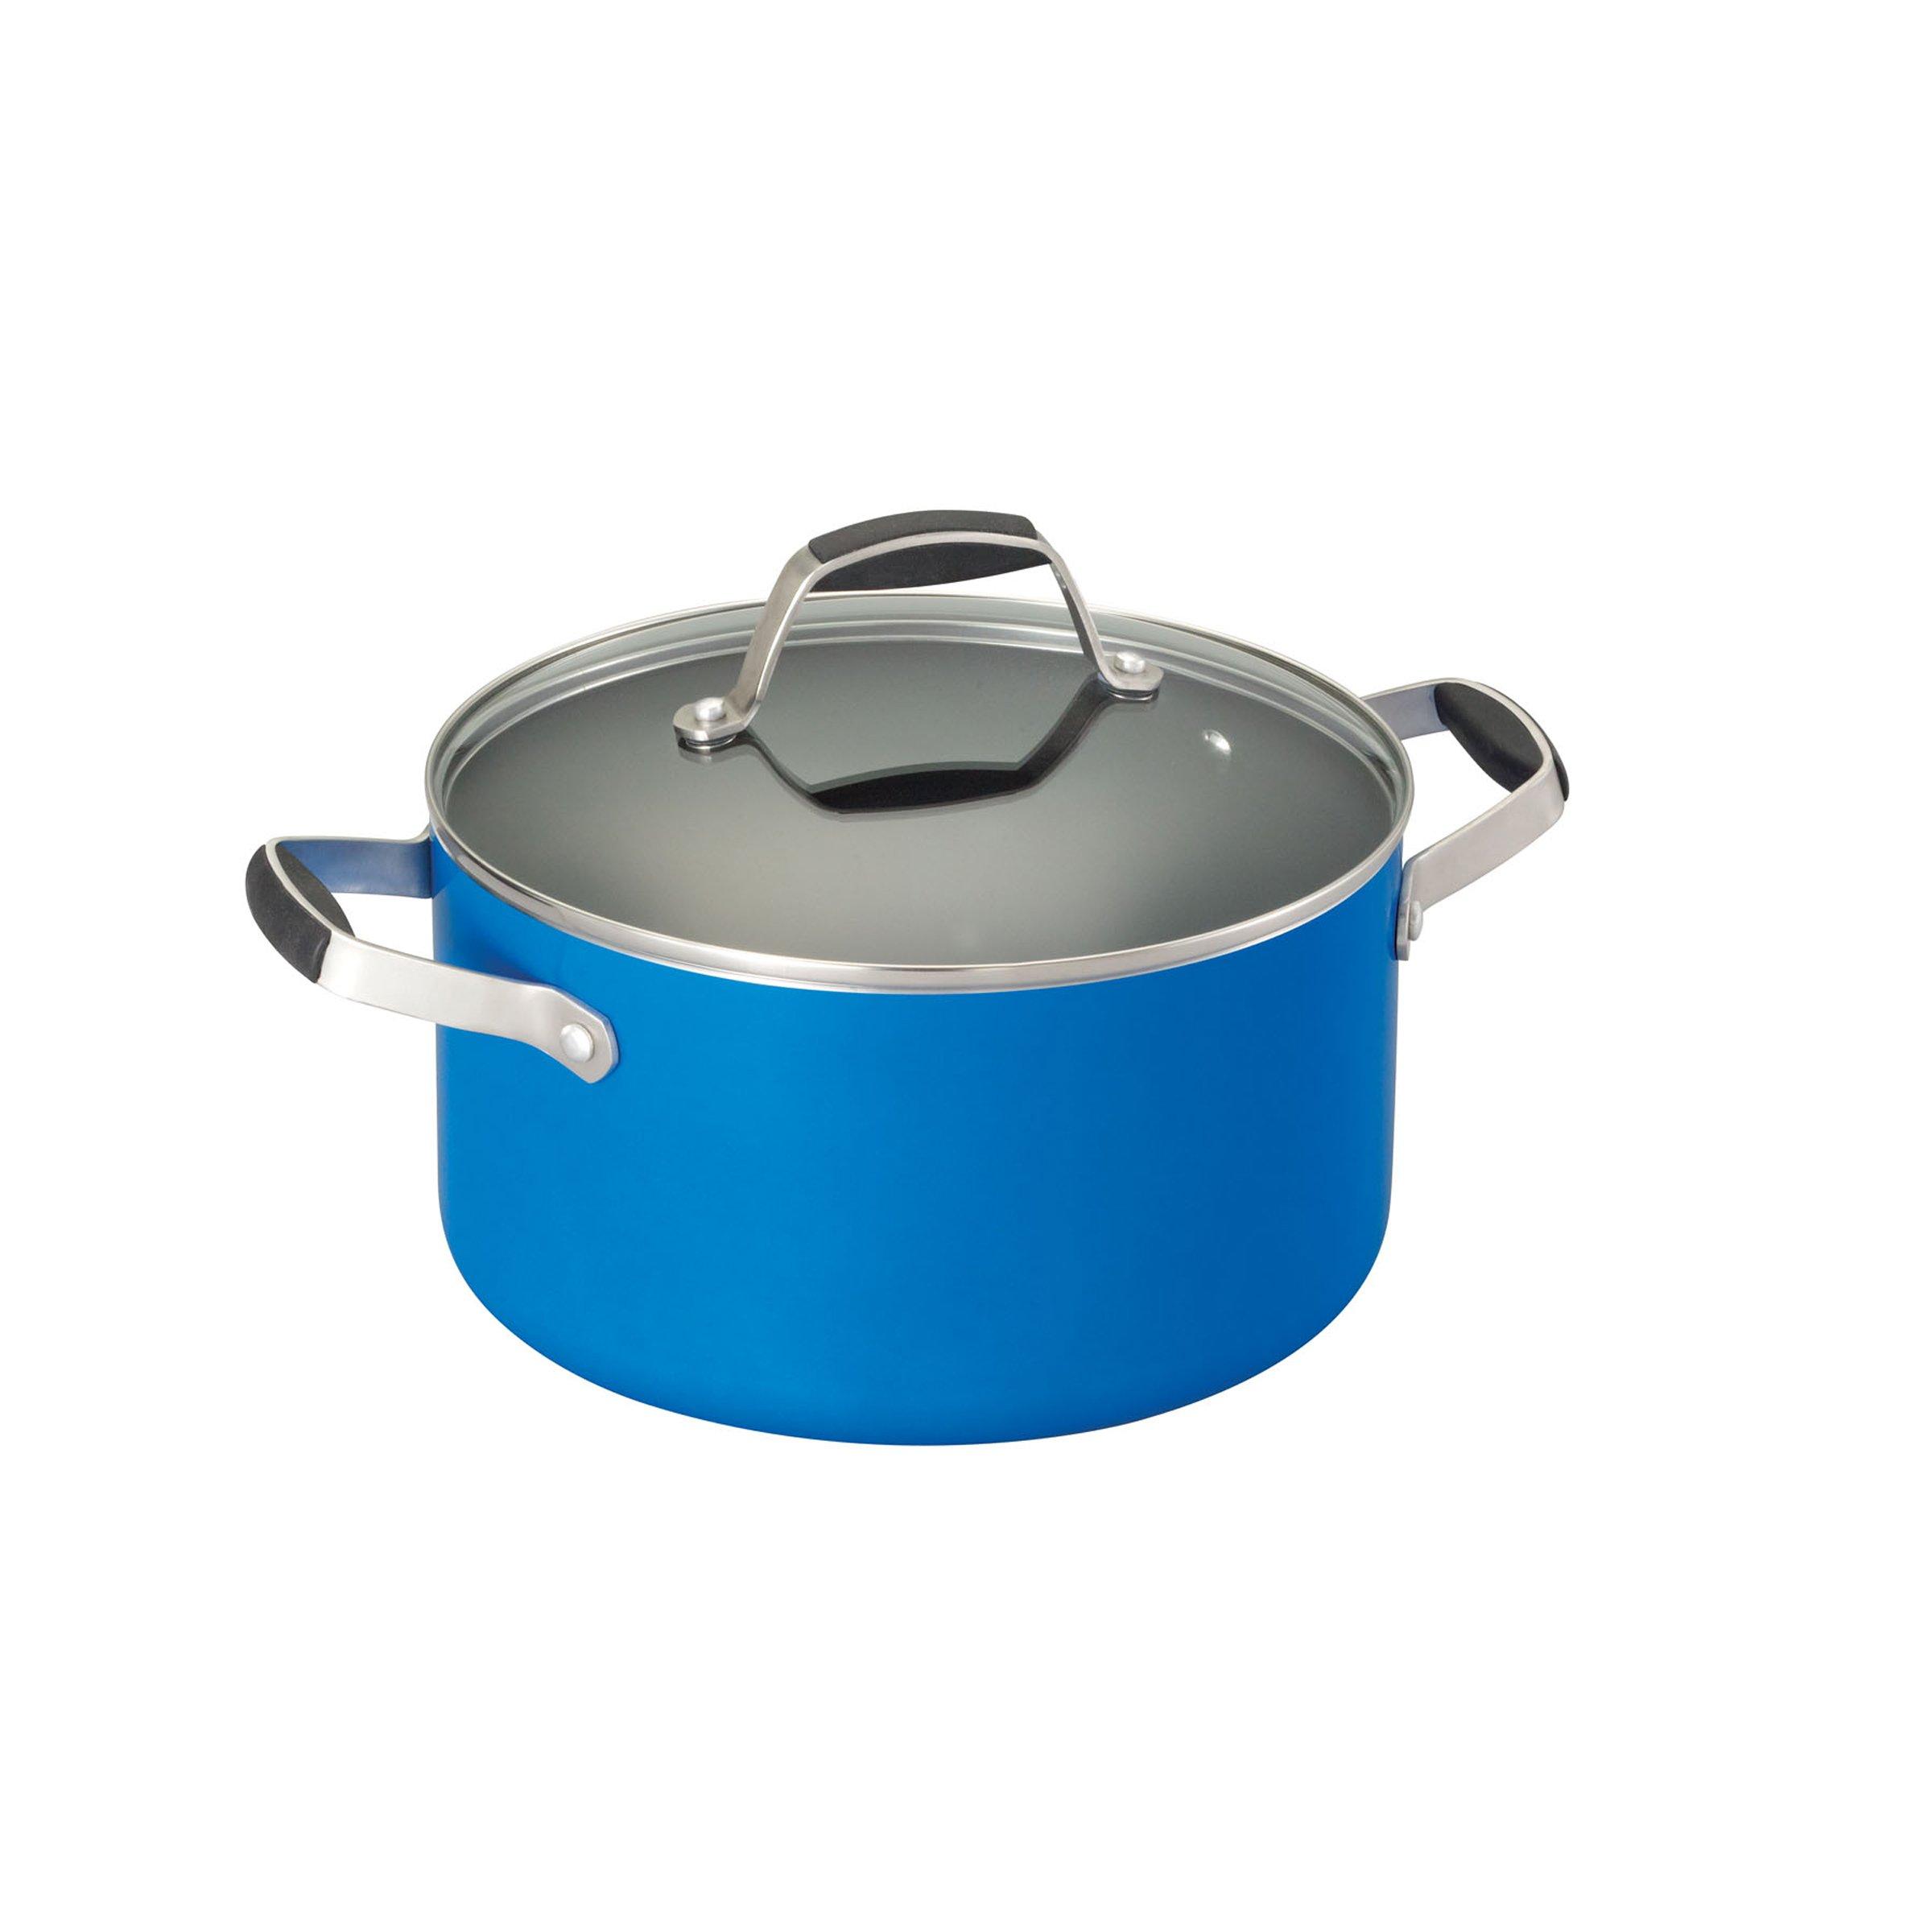 Guy Fieri Nonstick Aluminum 5.25-Quart Dutch Oven, Blue